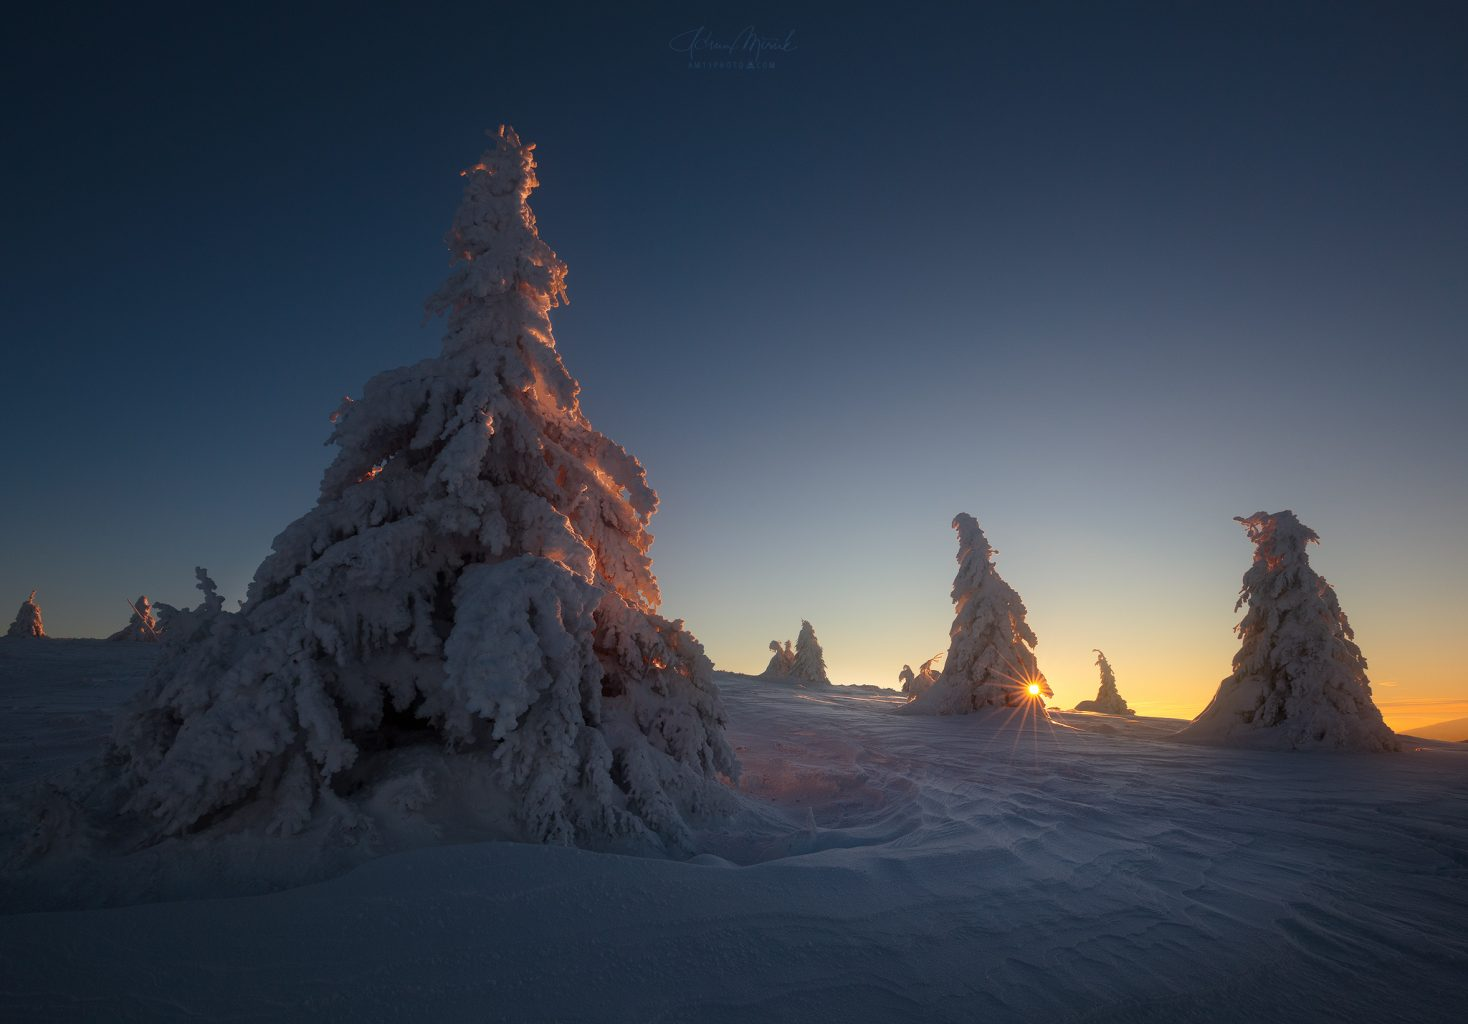 Zimná krajina Veľkej Fatry